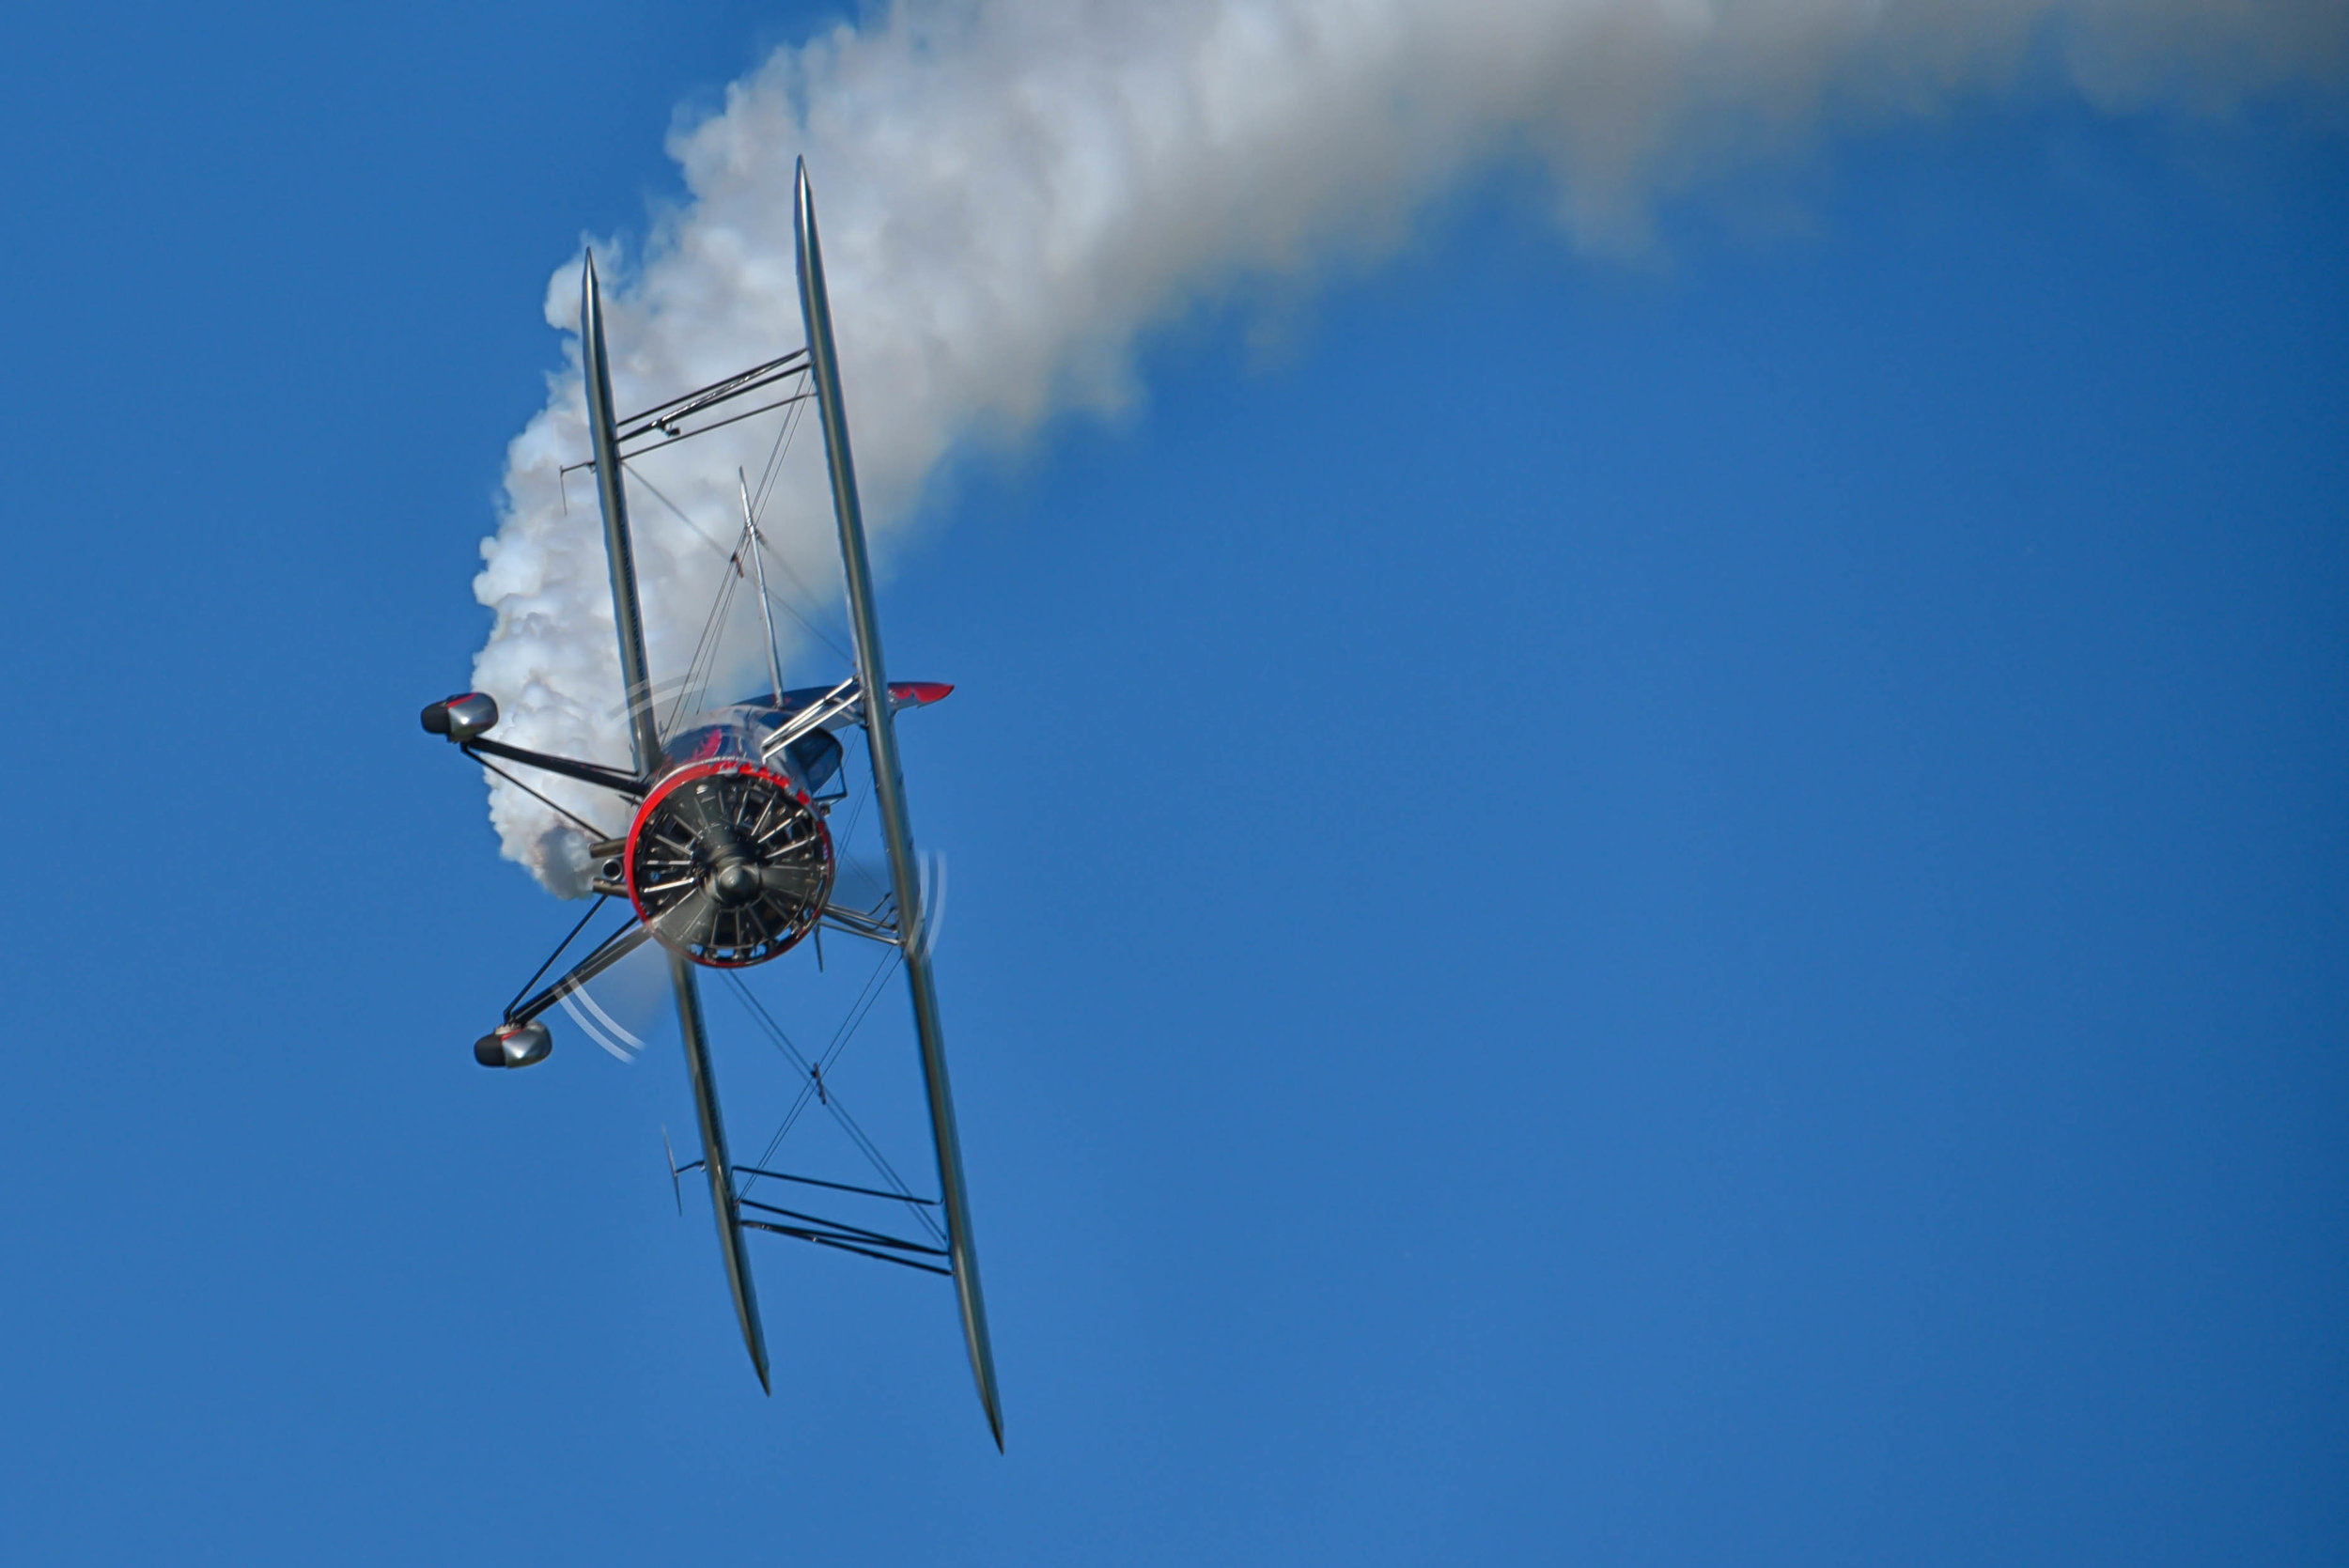 Kyle Franklin - Airshow Performer